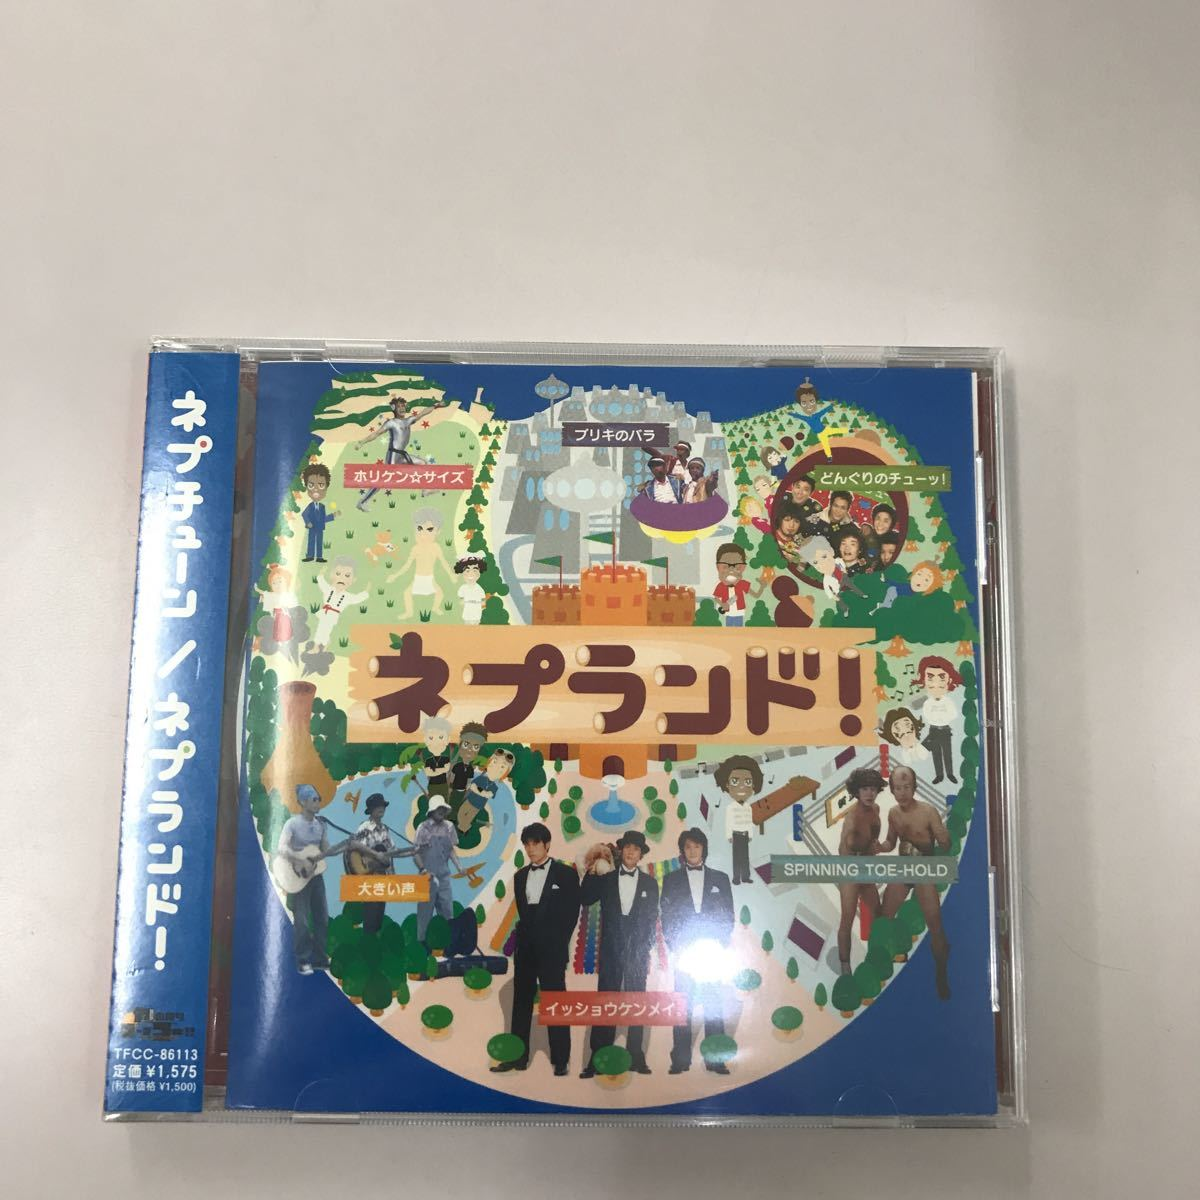 CD 新品未開封 長期保存品【邦楽】ネプチューン ネプランド!